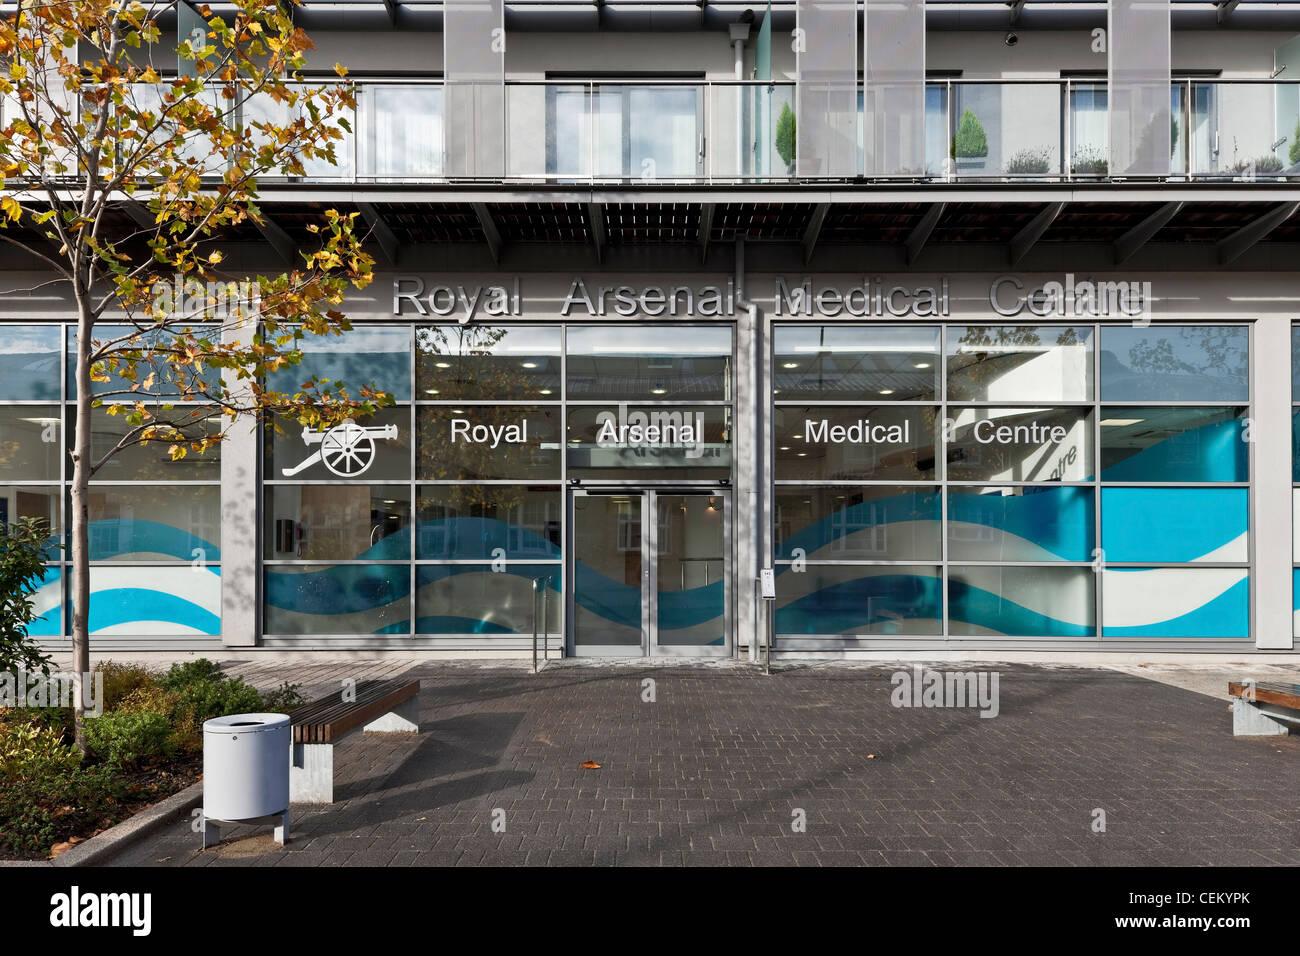 Arsenal Real Medical Center en Woolwich Imagen De Stock